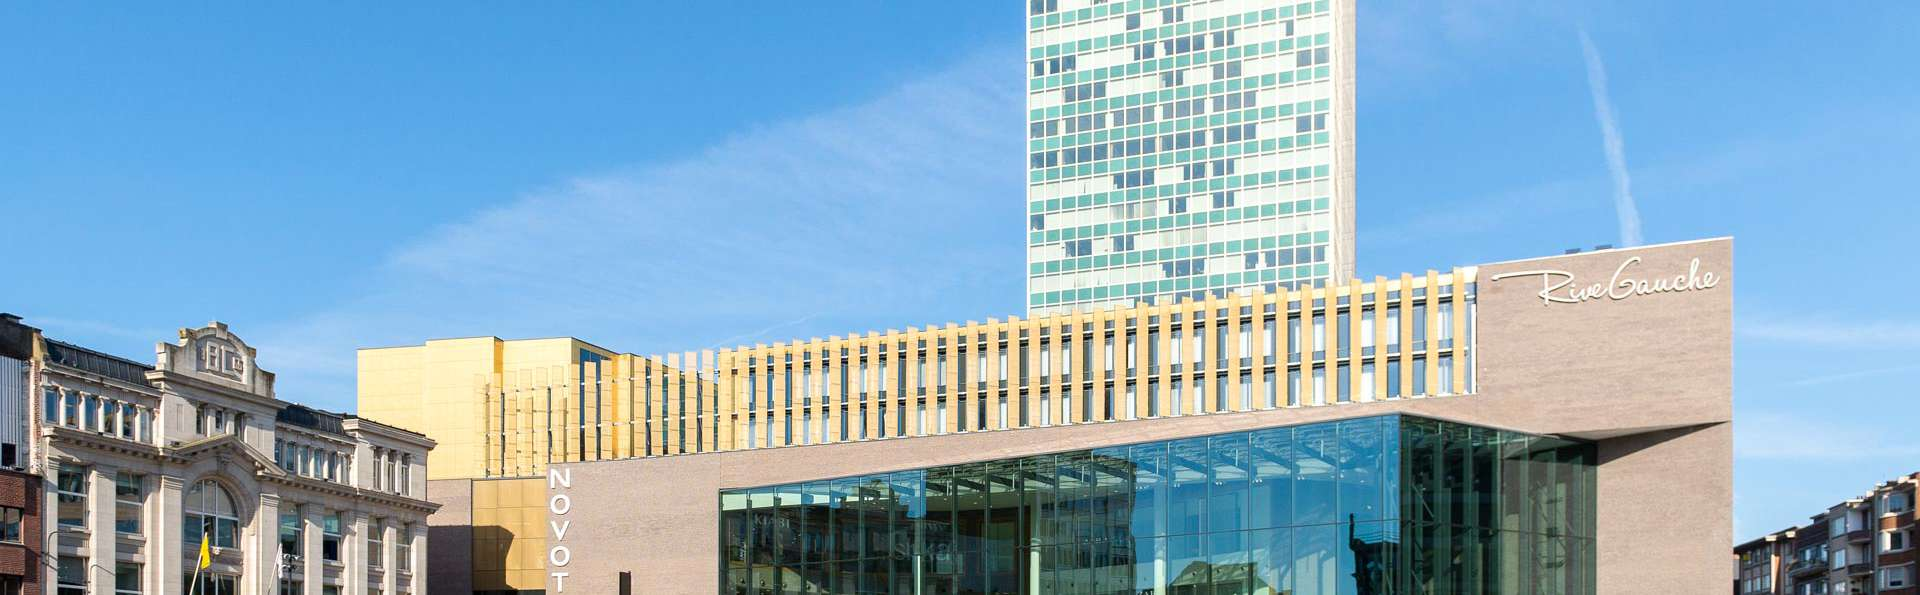 Novotel Charleroi Centre - EDIT_FRONT_02.jpg